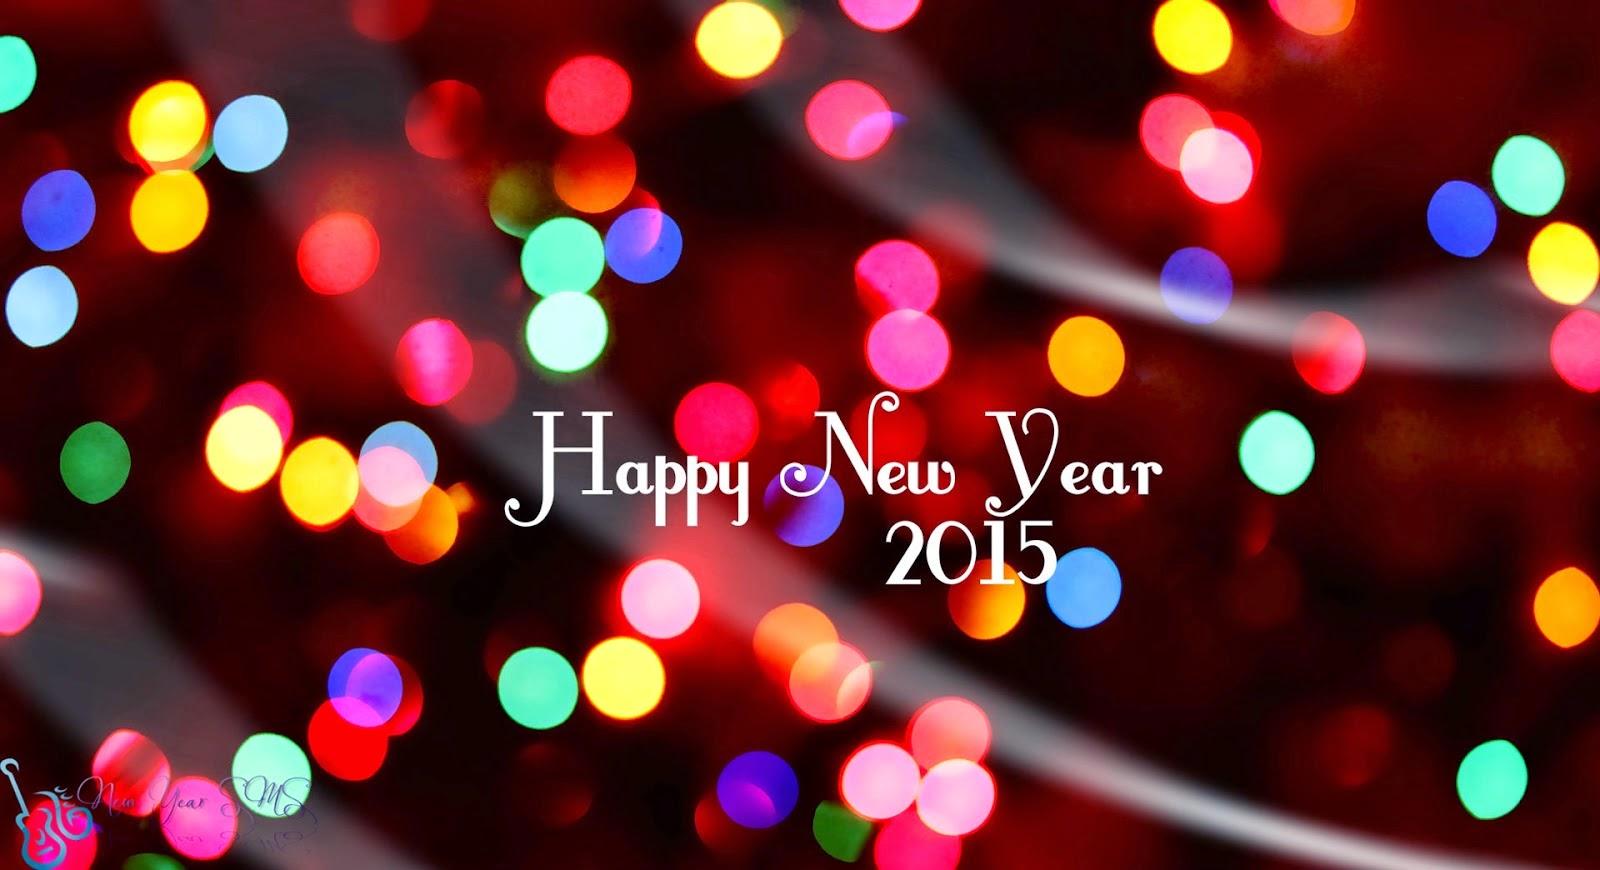 Happy New Year 2015 JASLEEN KAURS BLOG 1600x870